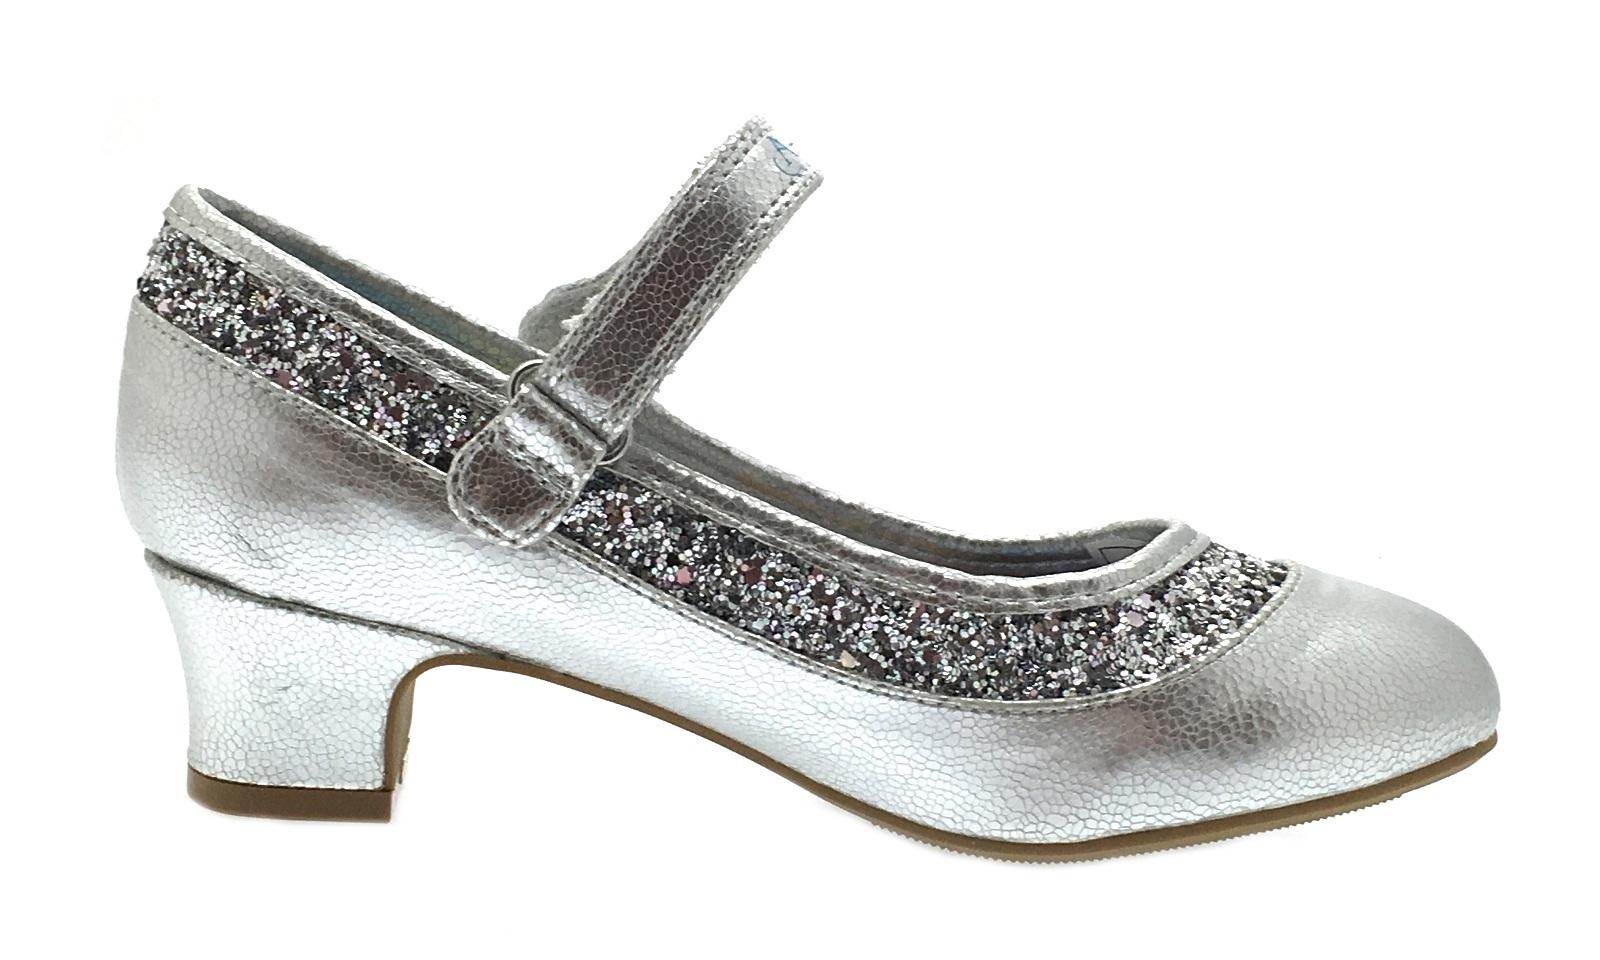 c338656bf08 Kids Girls Disney Frozen Dress Up Shoes Glitter Princess Low Heels ...